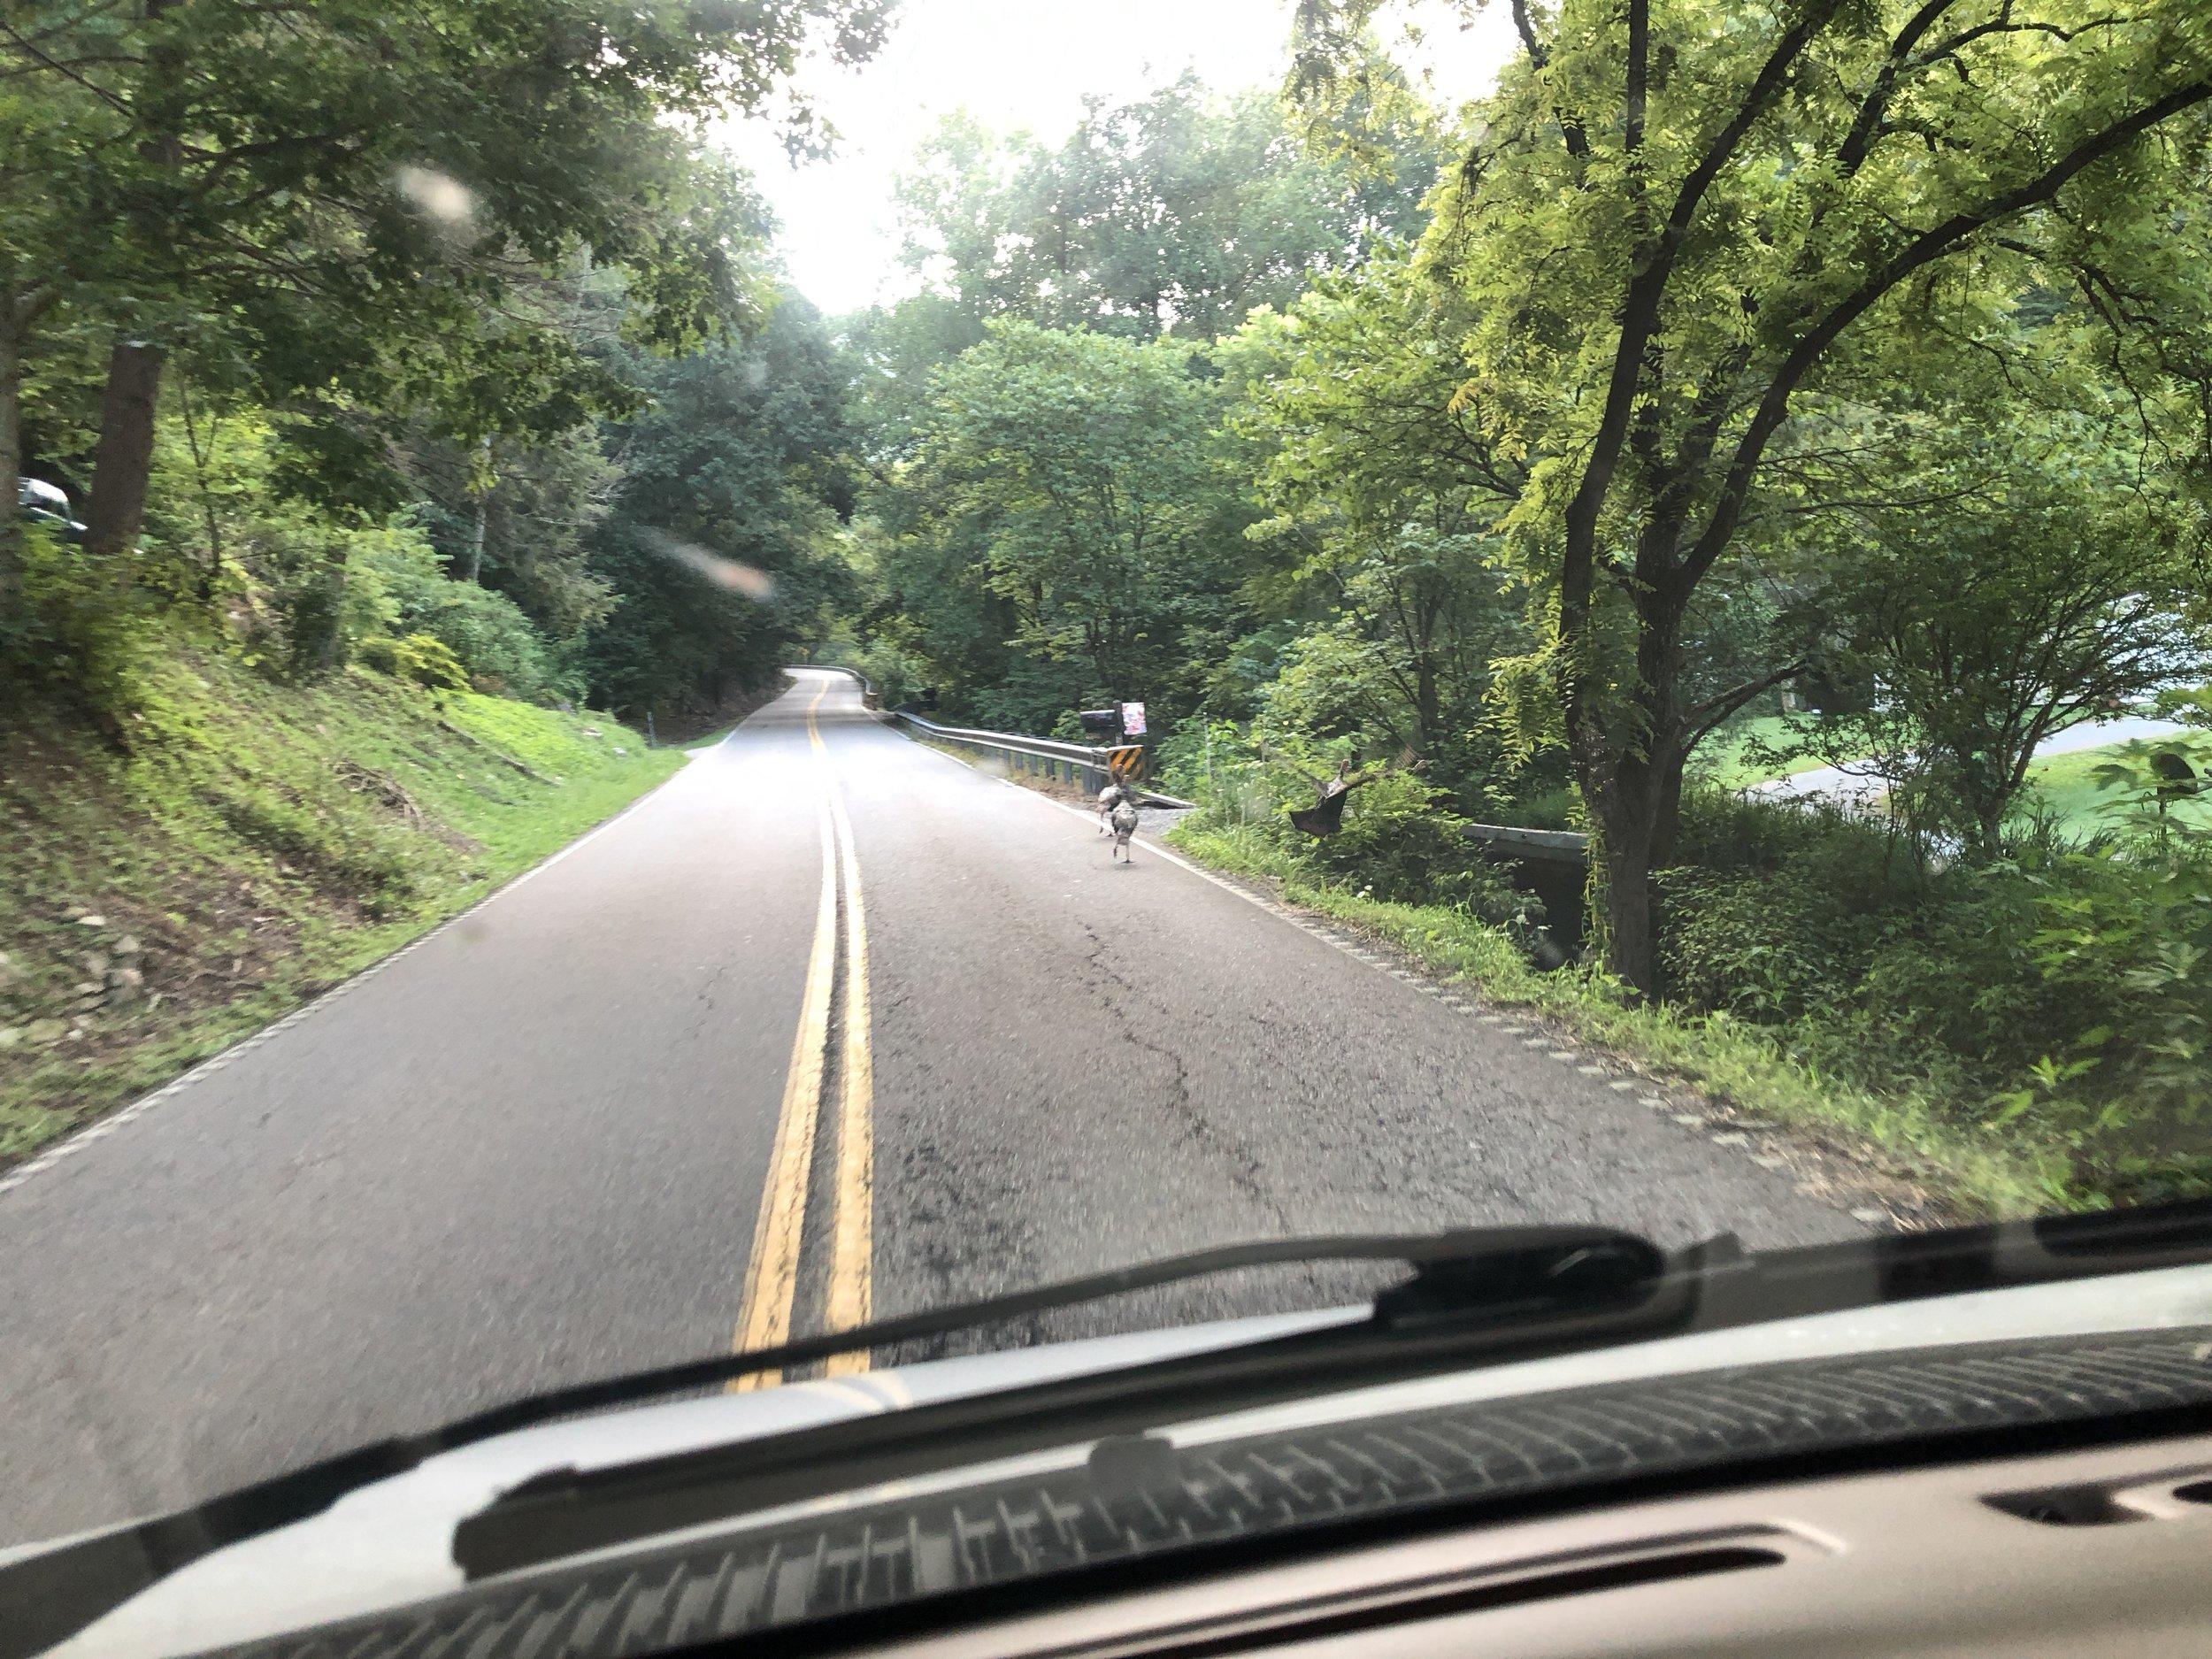 Them's wild turkeys in the road!